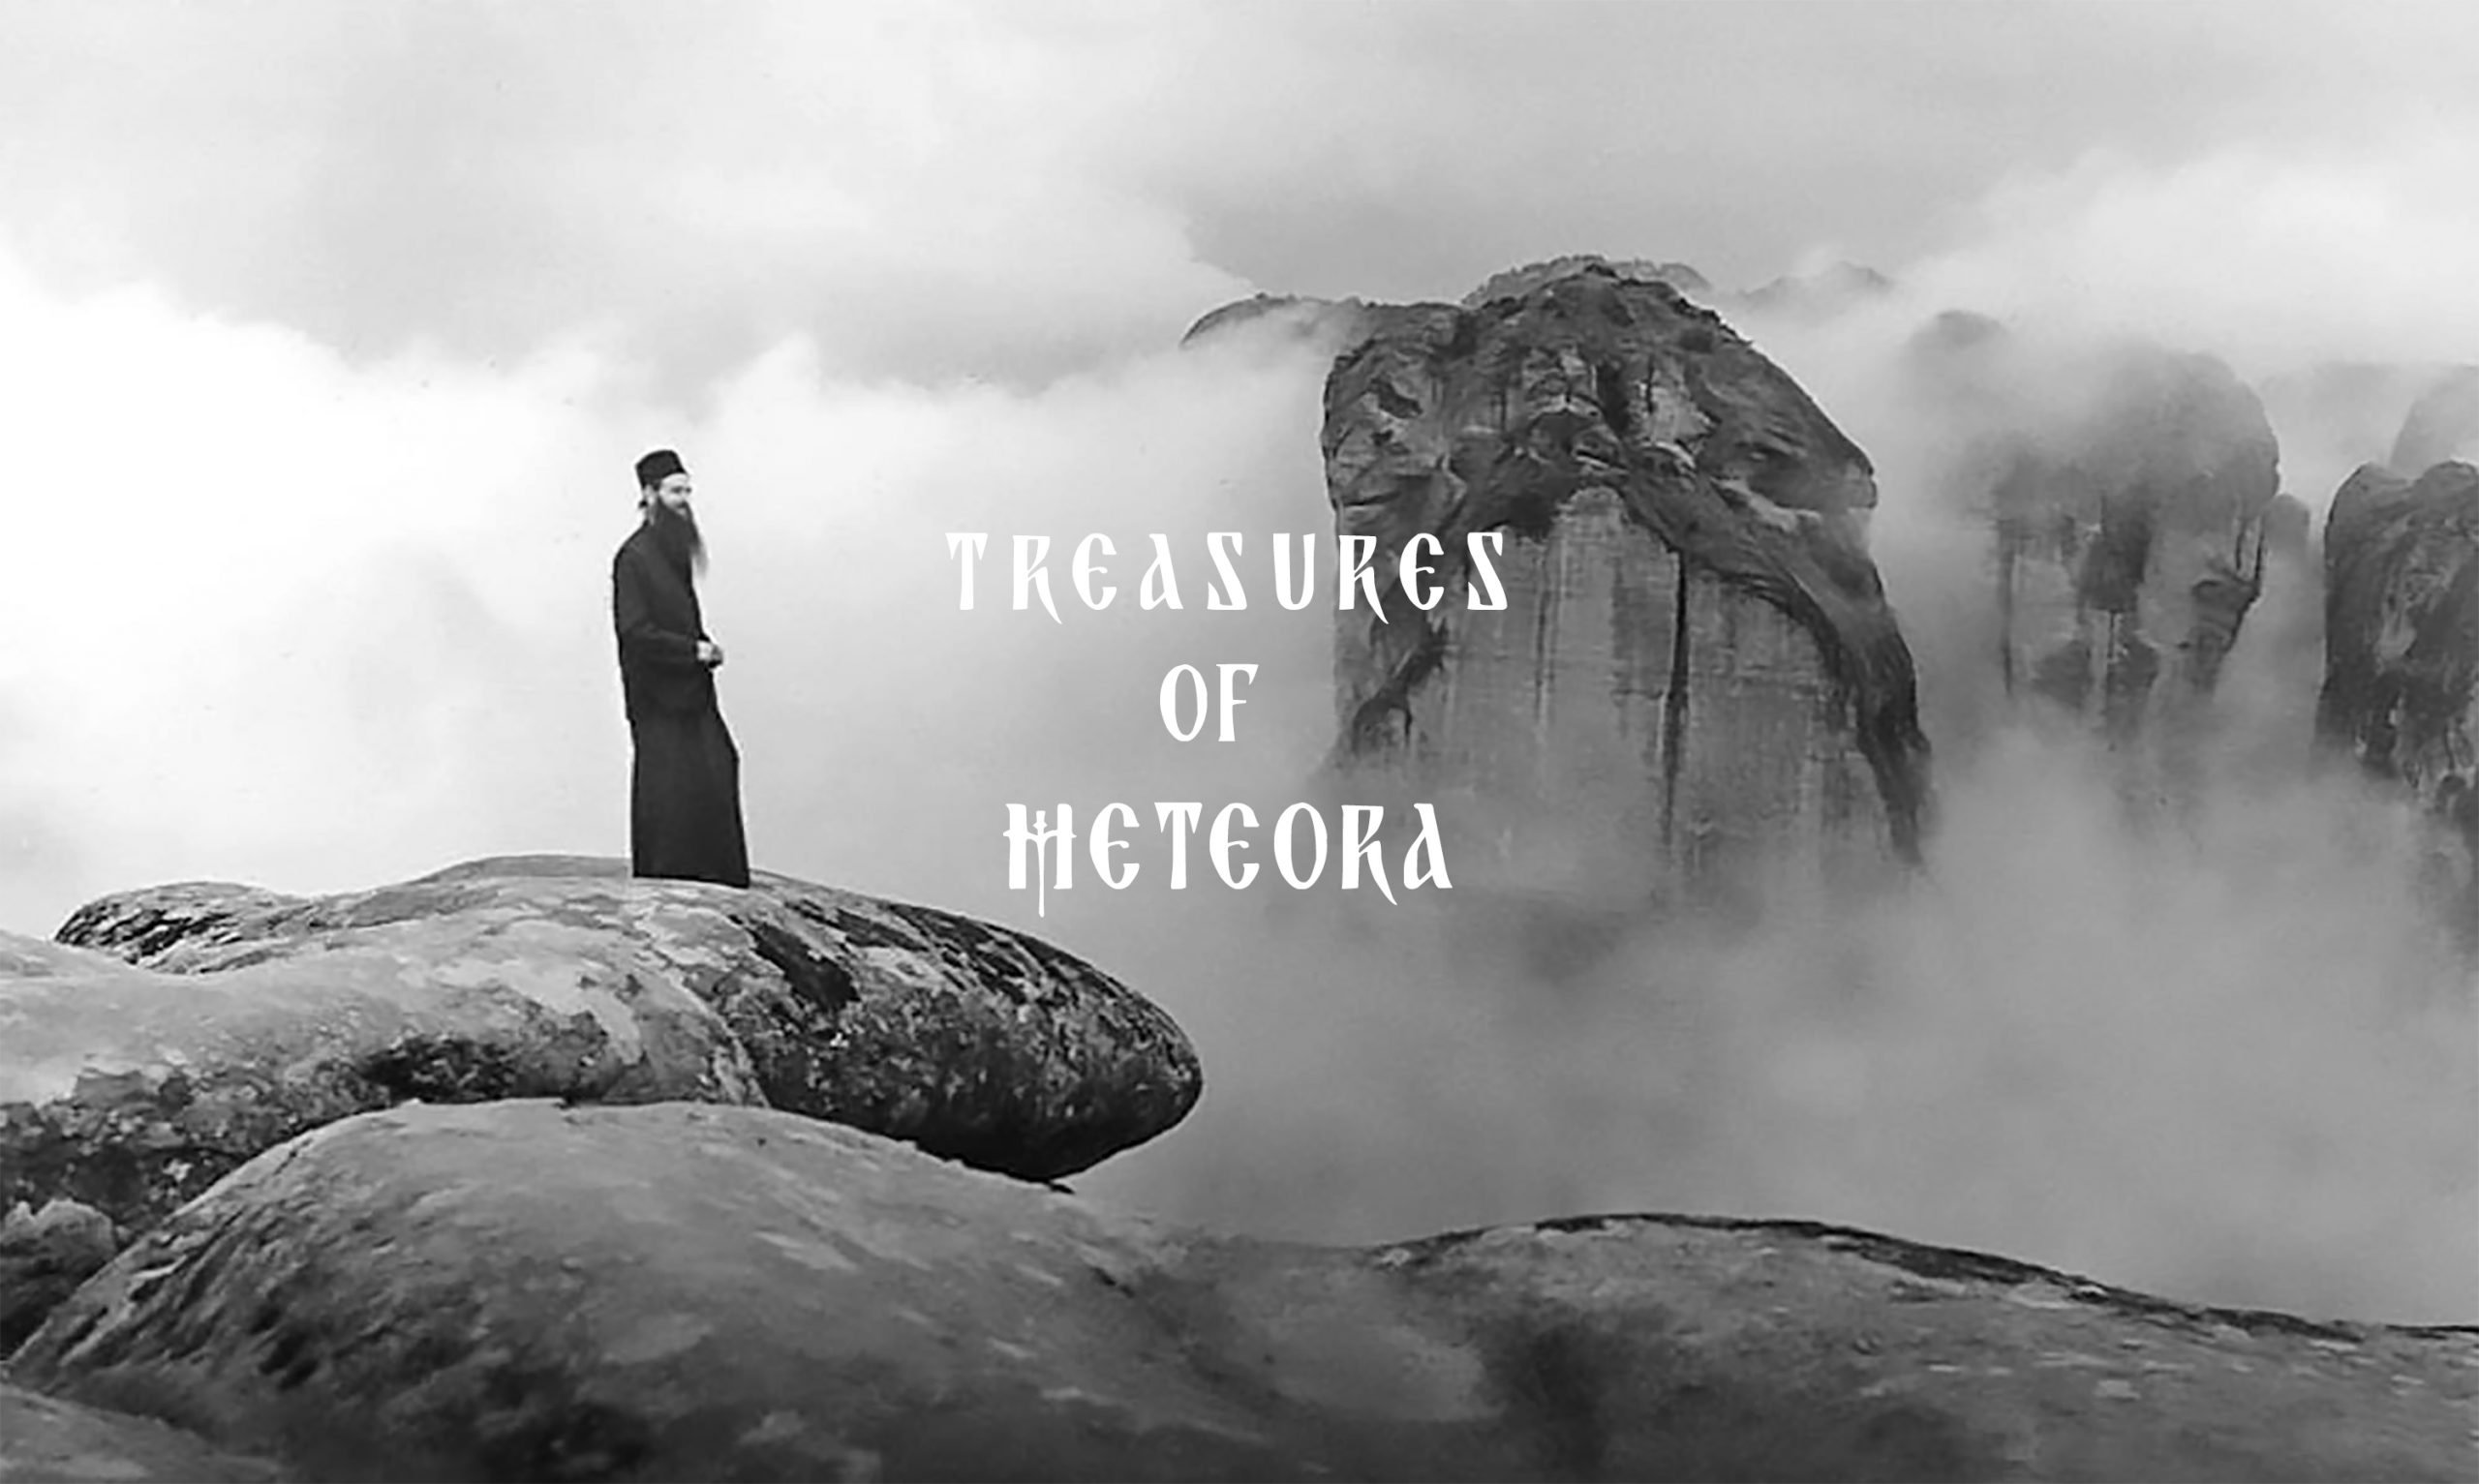 treasures of meteora youtube art L